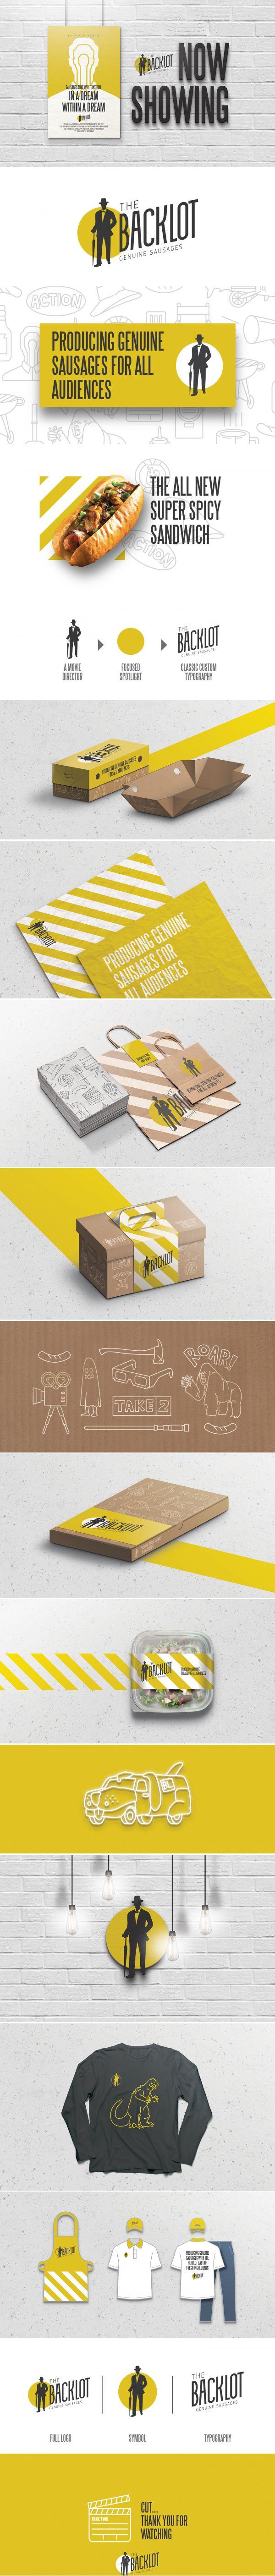 The Backlot by Studio AIO